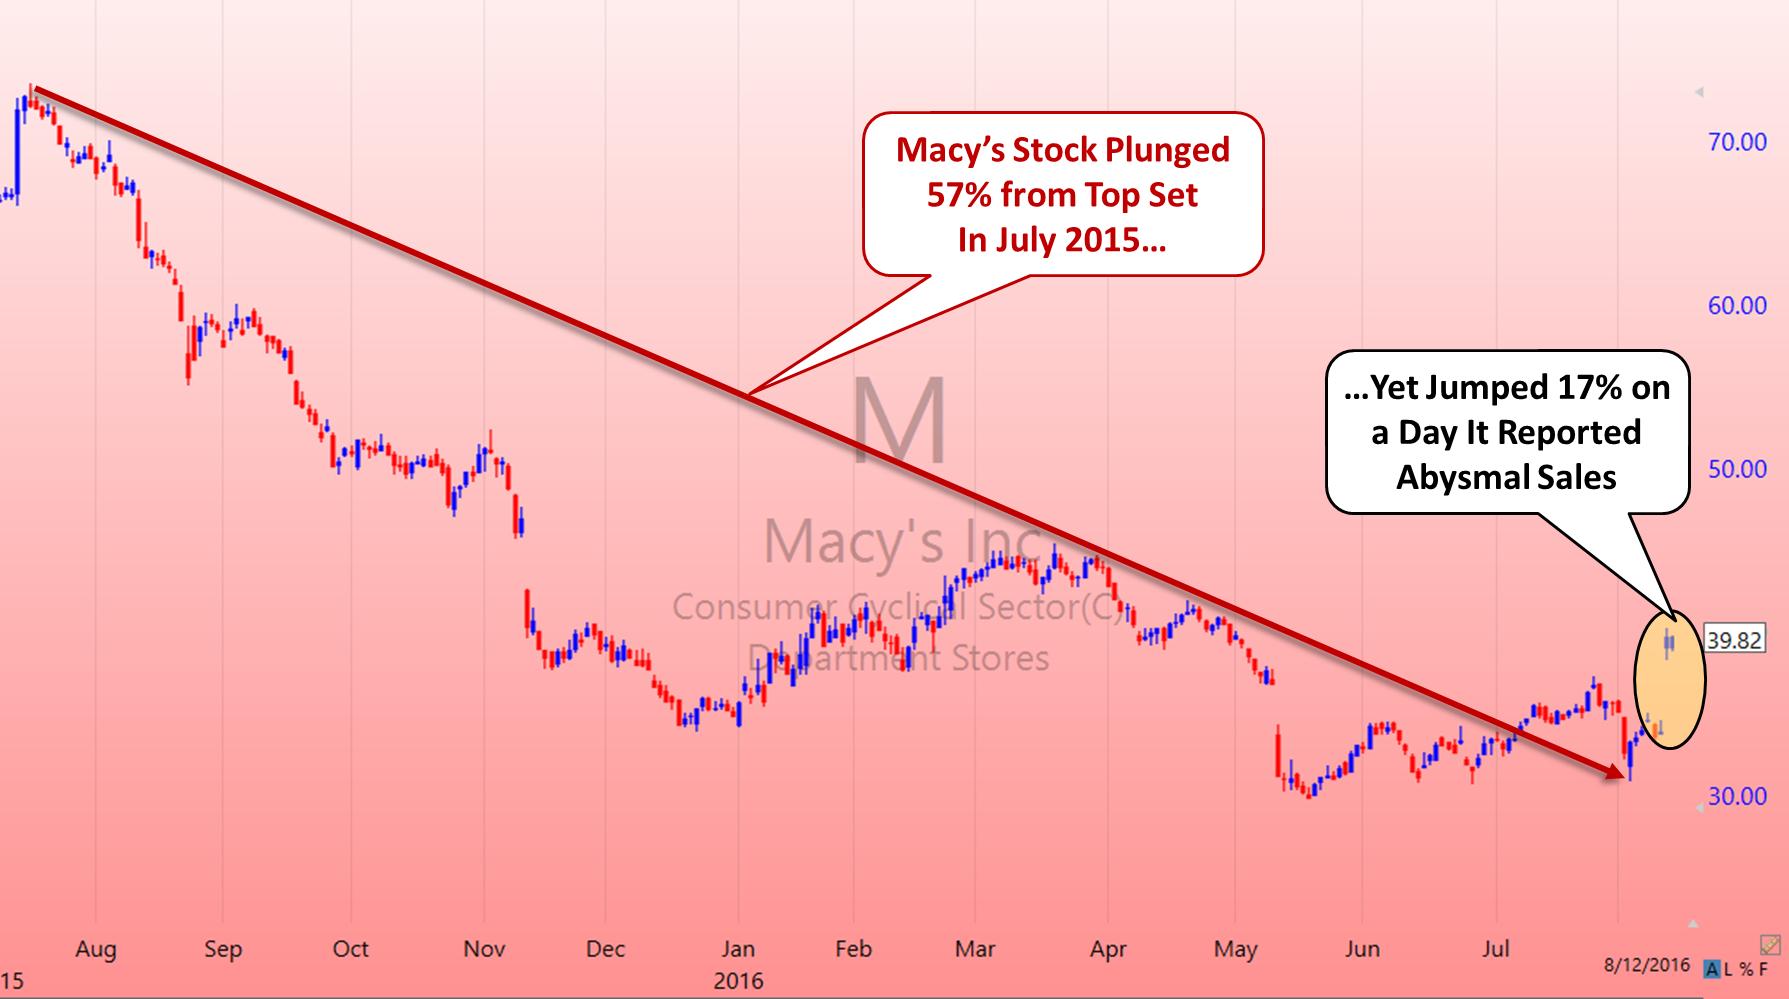 HedgeFolios Macys chart - 8-12-16v2